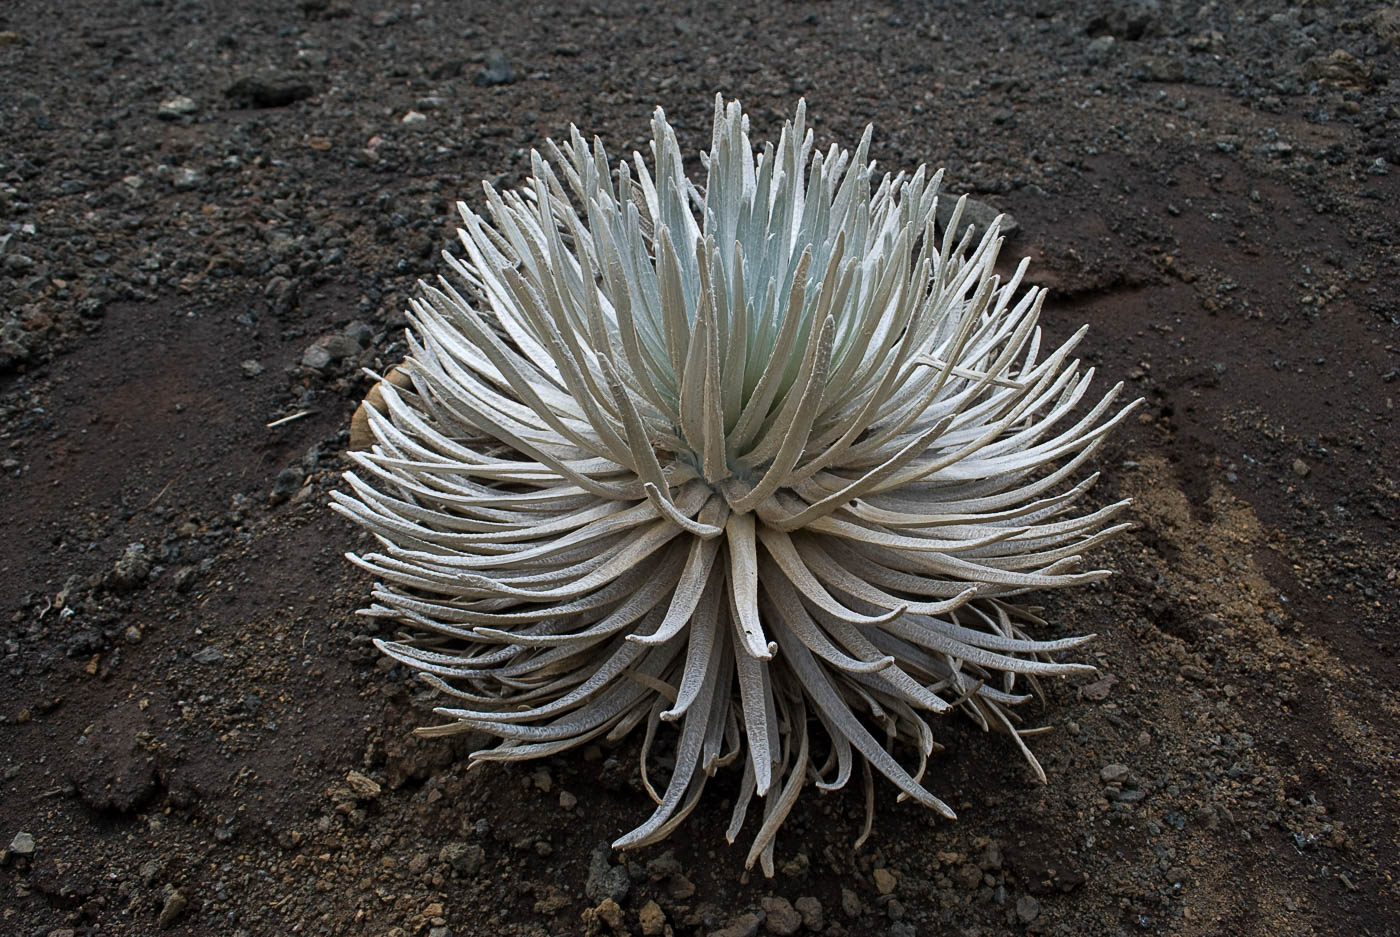 Silversward Trail, Haleakala Crater, Maui | Pono Images